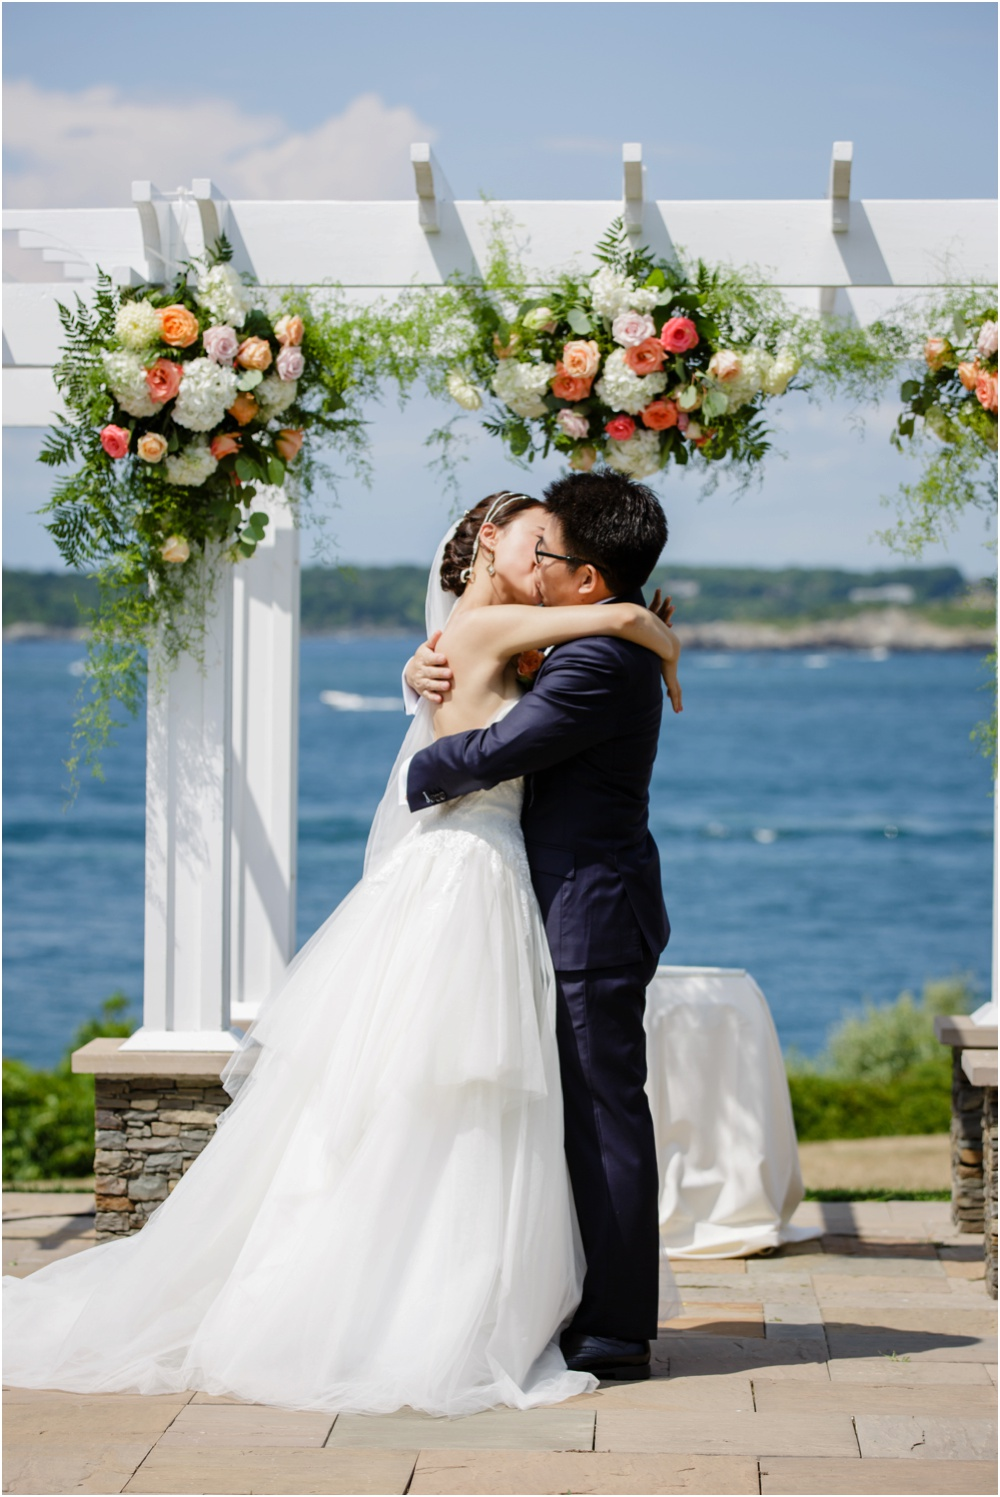 RI-Wedding-Photographer-Lefebvre-Photo-Blog_3213.jpg